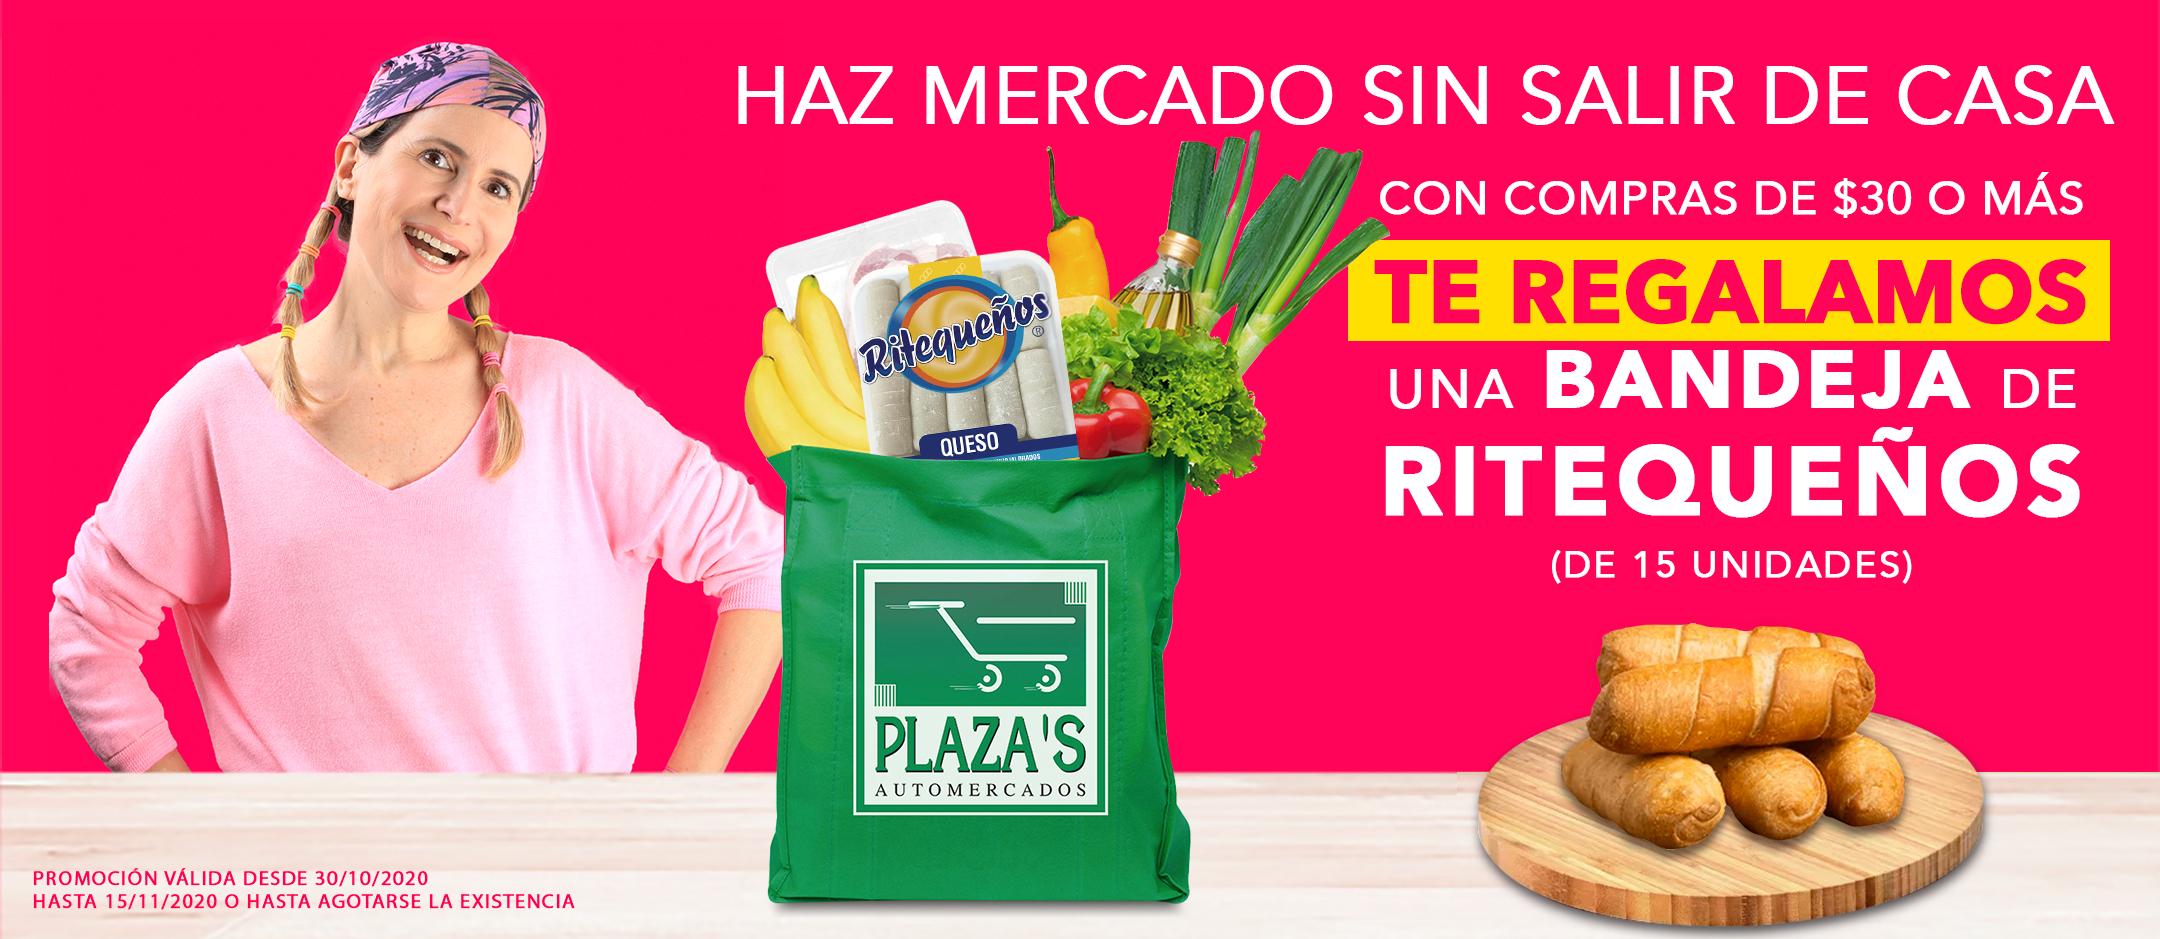 1 Automercados Plazas